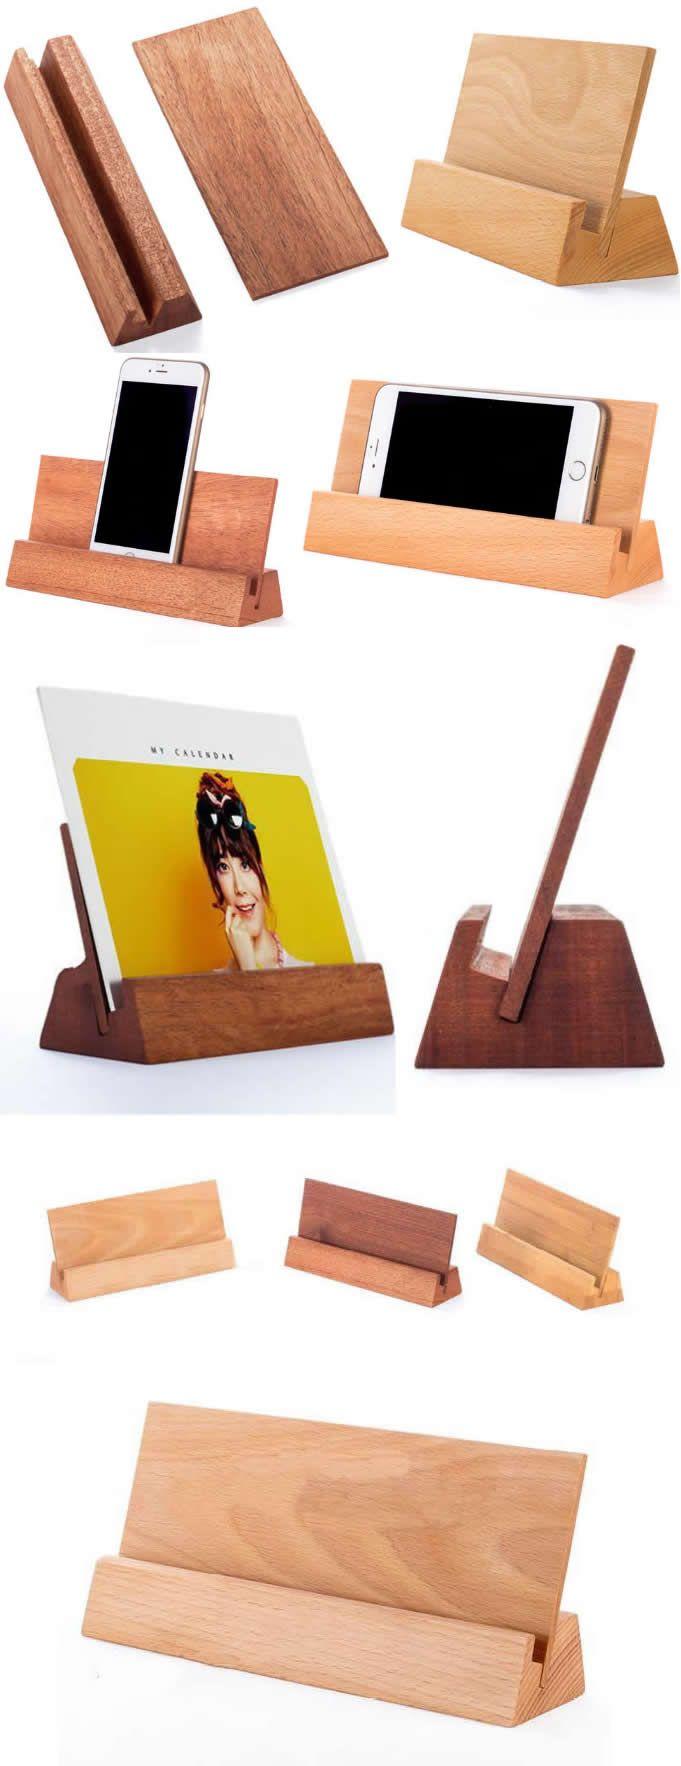 Bamboo Wooden Place Card Holder Photo Card Holder Iphone Ipad Smart Phone Holder Dock Busines Wooden Place Card Holders Business Card Displays Diy Phone Holder